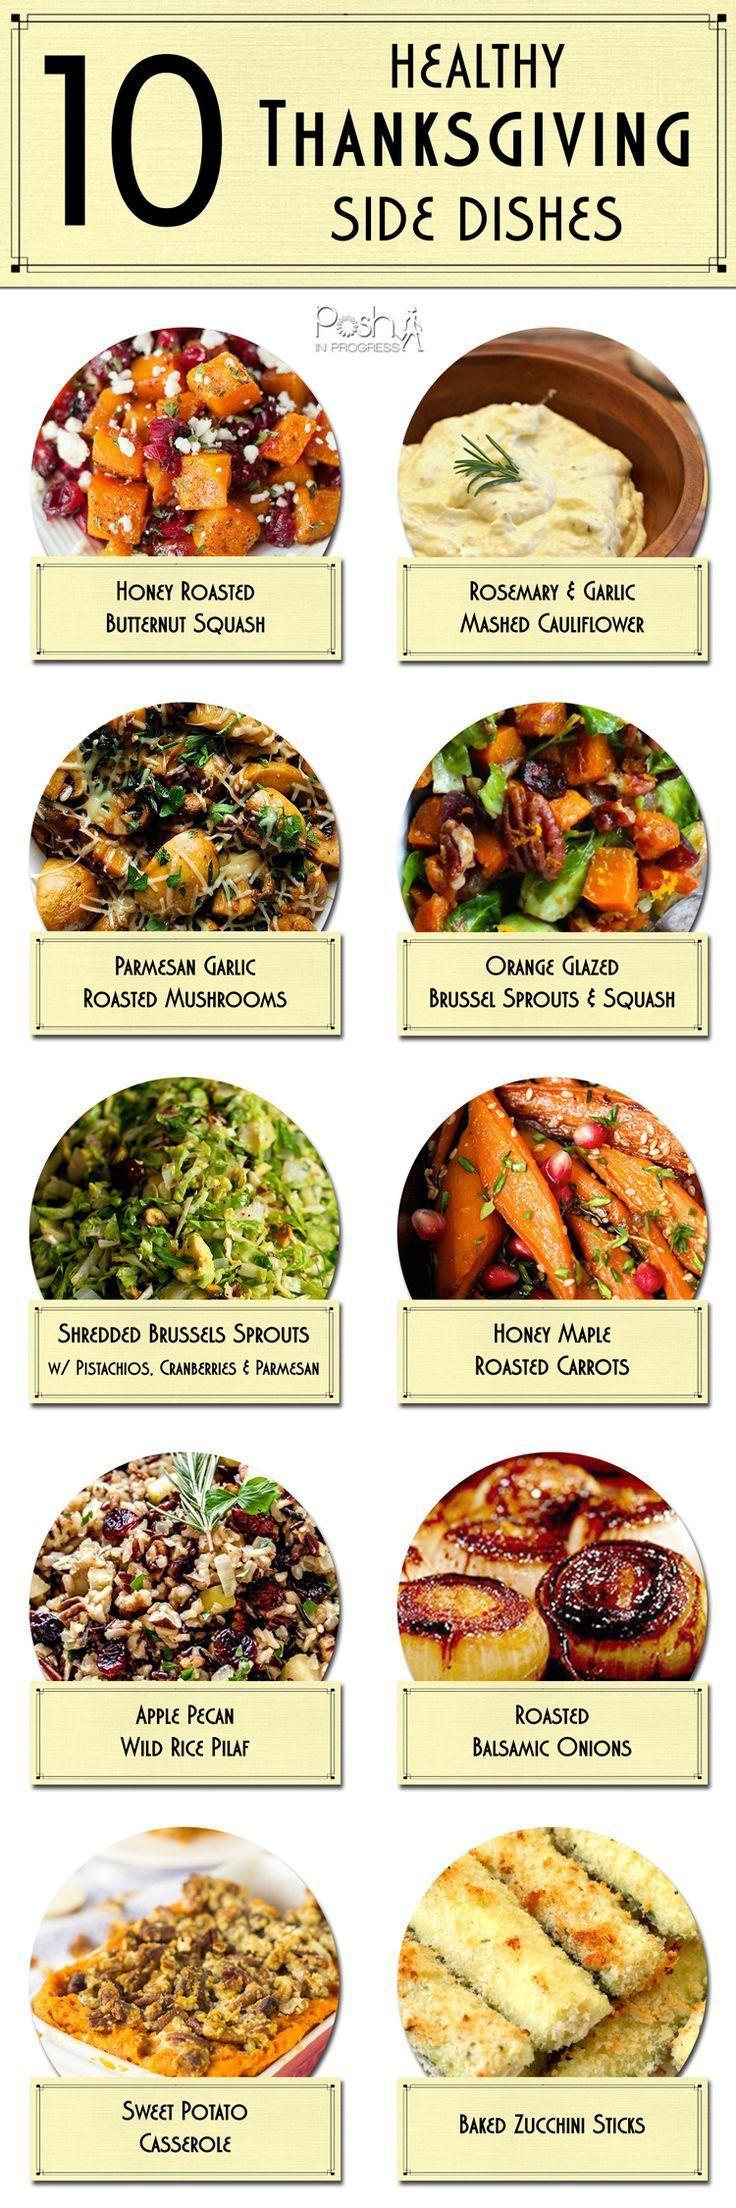 Healthy Thanksgiving Menu  10 Healthy Thanksgiving Sides